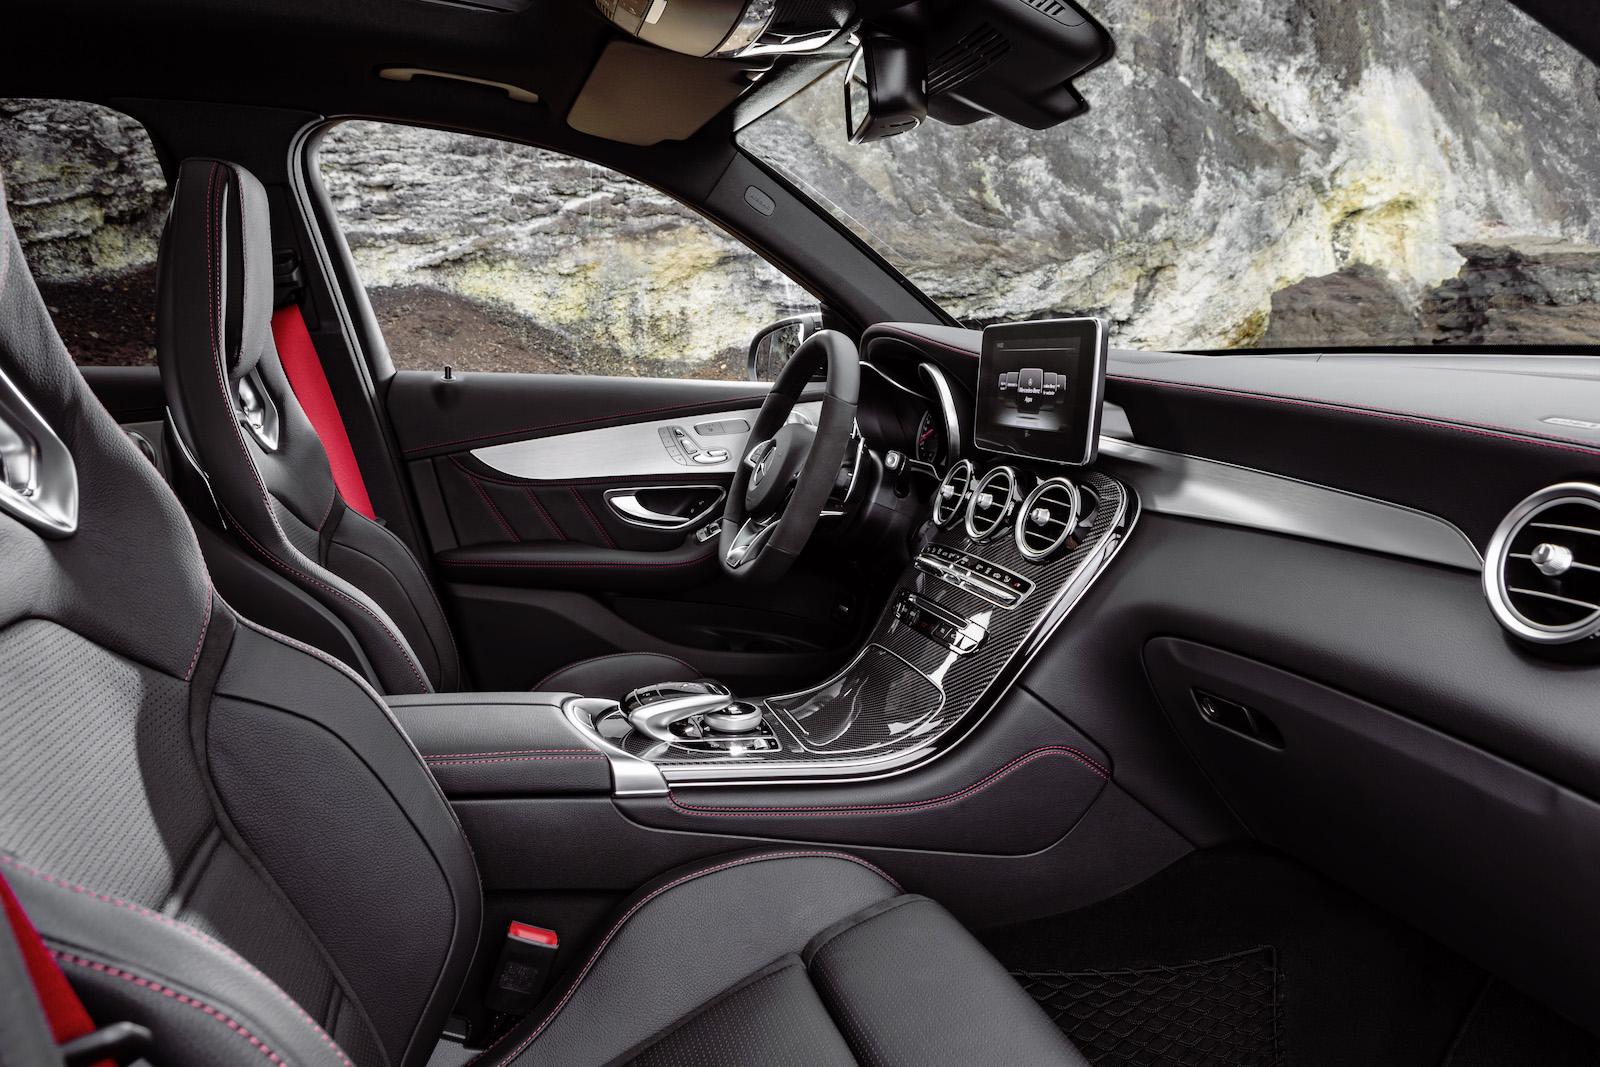 Mercedes GLC 43 AMG 4Matic